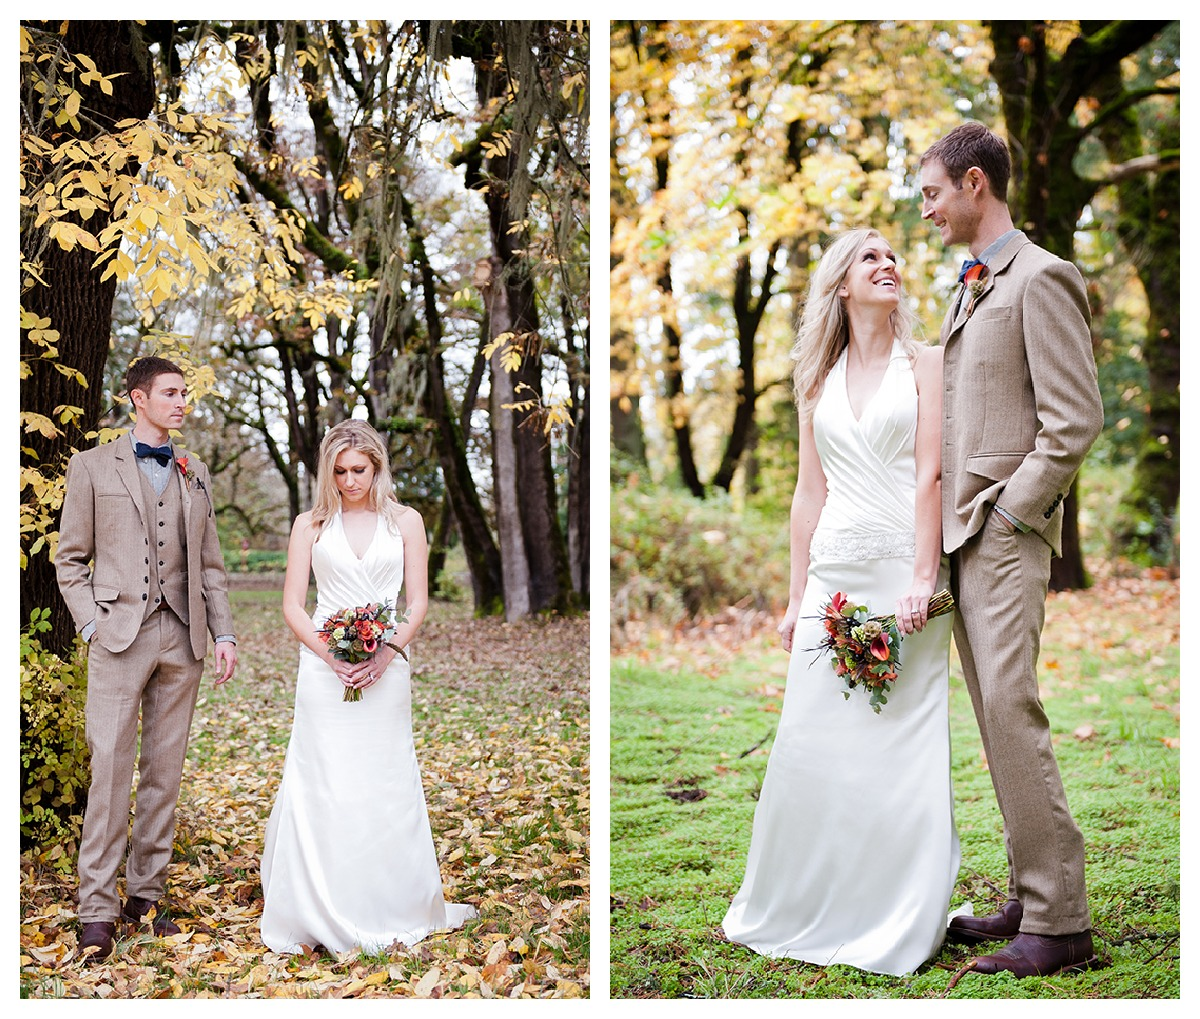 Pendleton Rustic Wedding Inspiration Shoot Rustic Wedding Chic